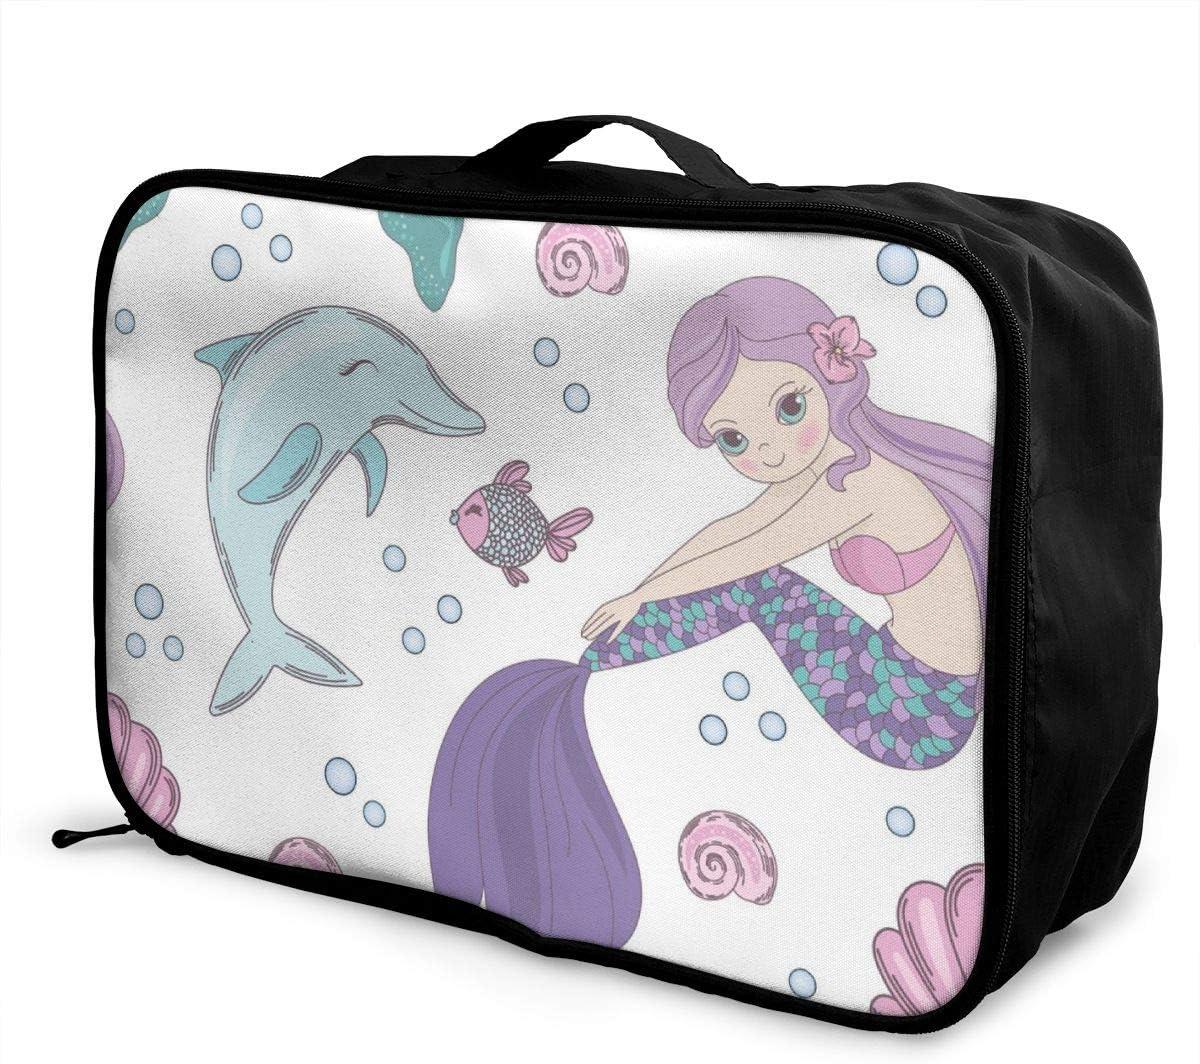 Yunshm Underwater World Mermaid Seamless Pattern Vector Image Customized Trolley Handbag Waterproof Unisex Large Capacity For Business Travel Storage